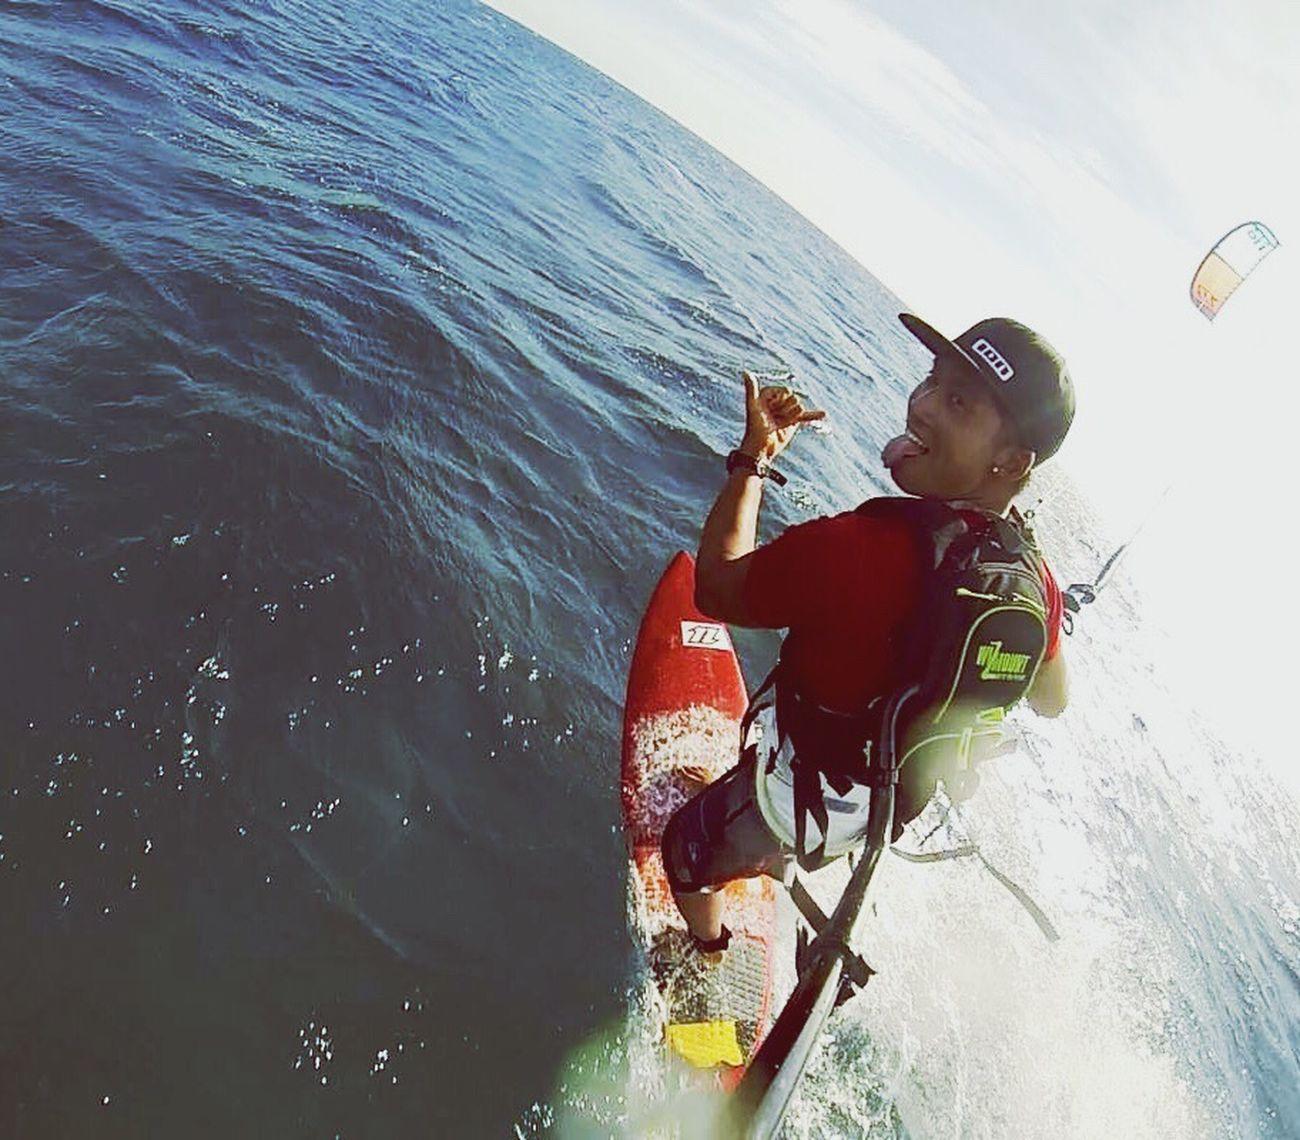 Always amazing when you fly😂😂👌🏼✌🏼🏝☀️ 🌊🏄🏻 Water Day Sea Sky EyeEm Gallery Kitesurfing EyeEm Best Shots Sogood Hot Day Paradise Island 🌴